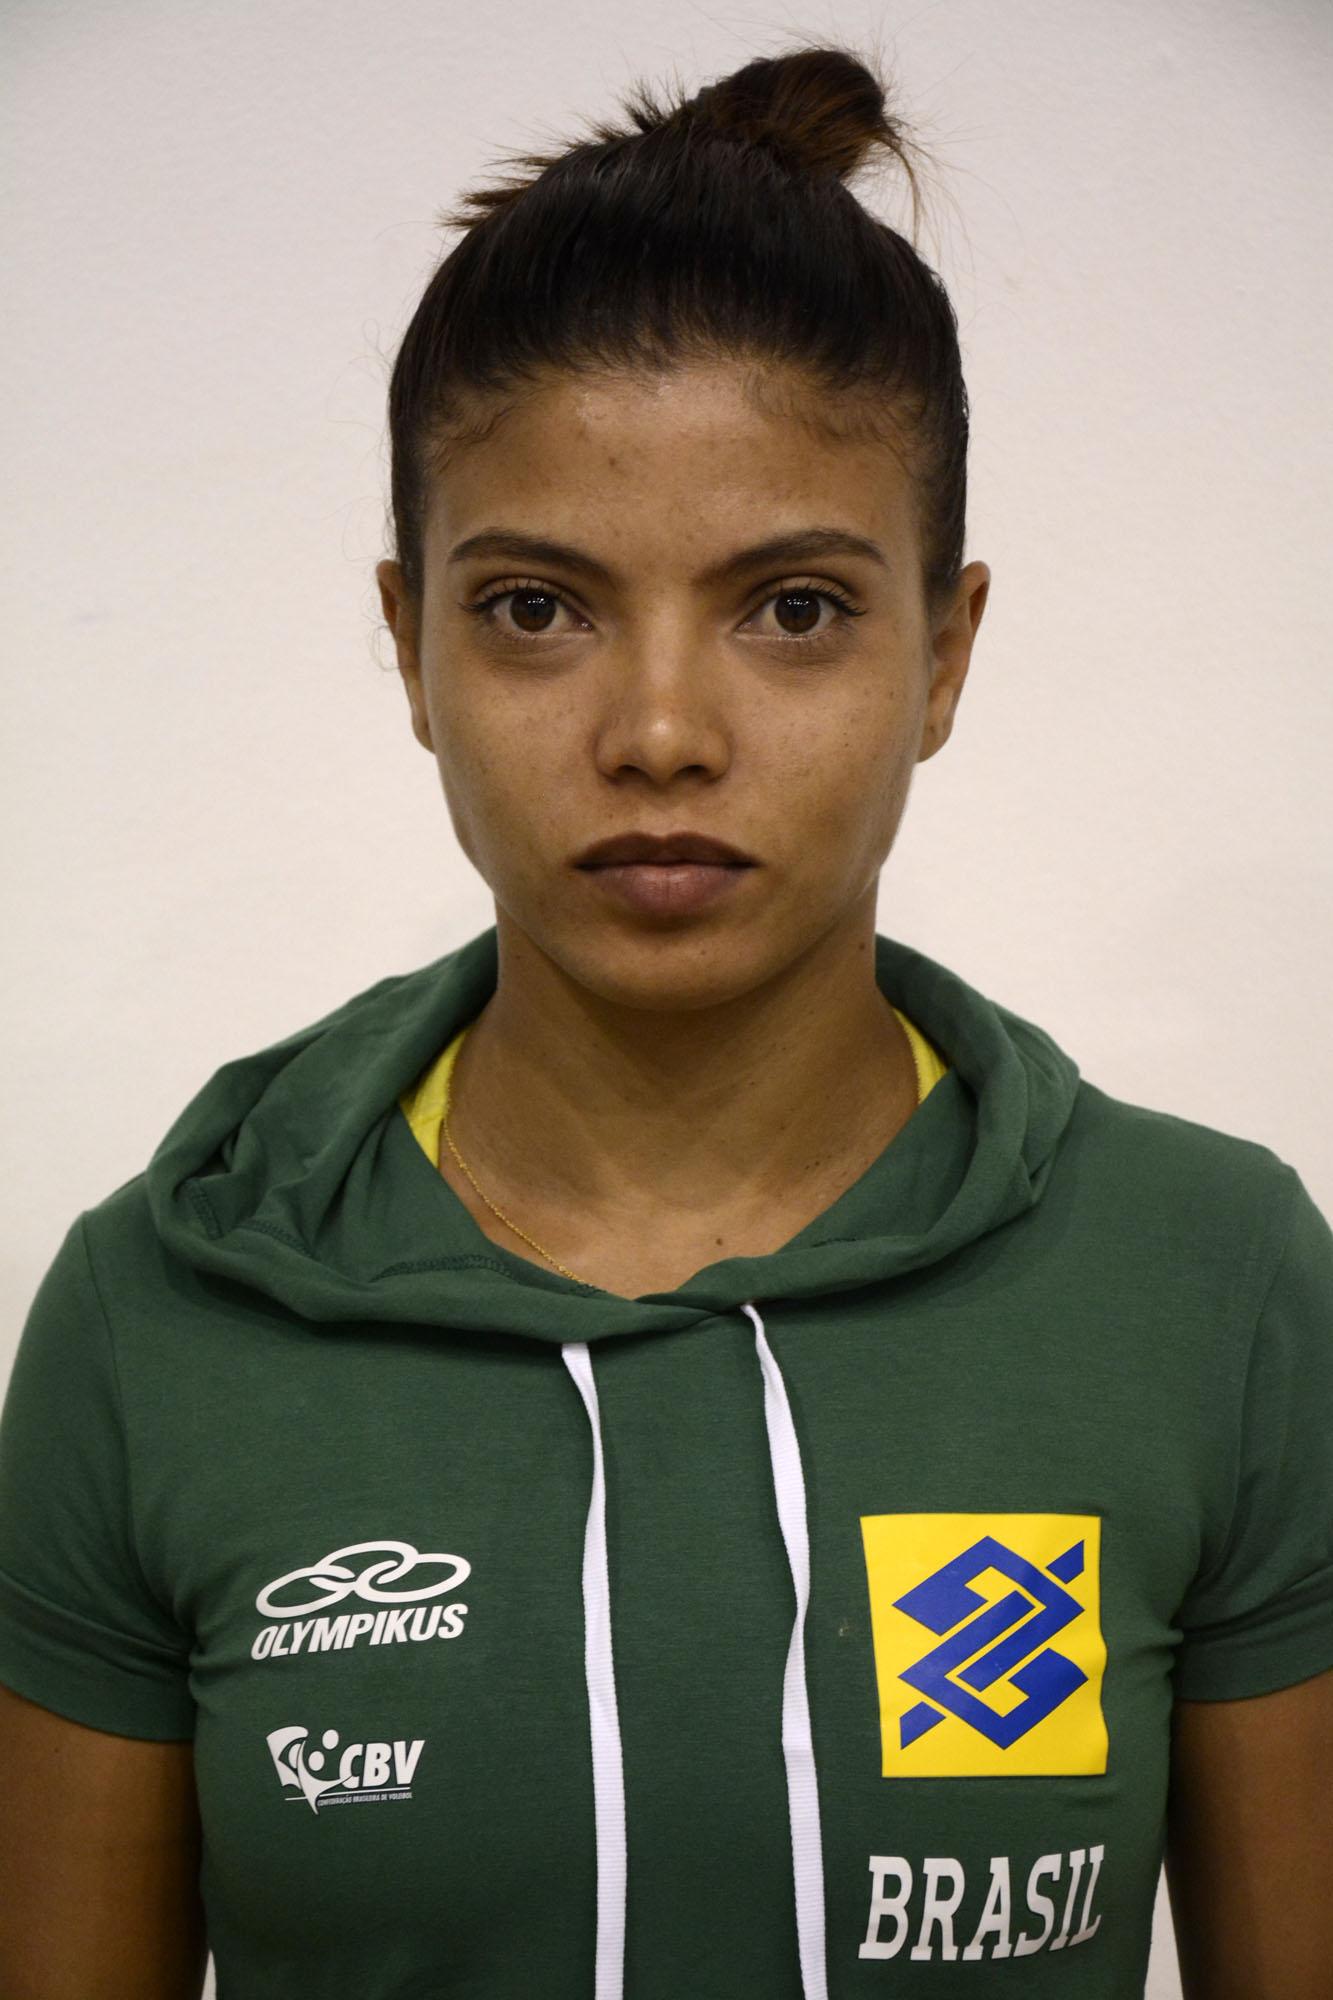 Leia Henrique Da Silva Nicolosi